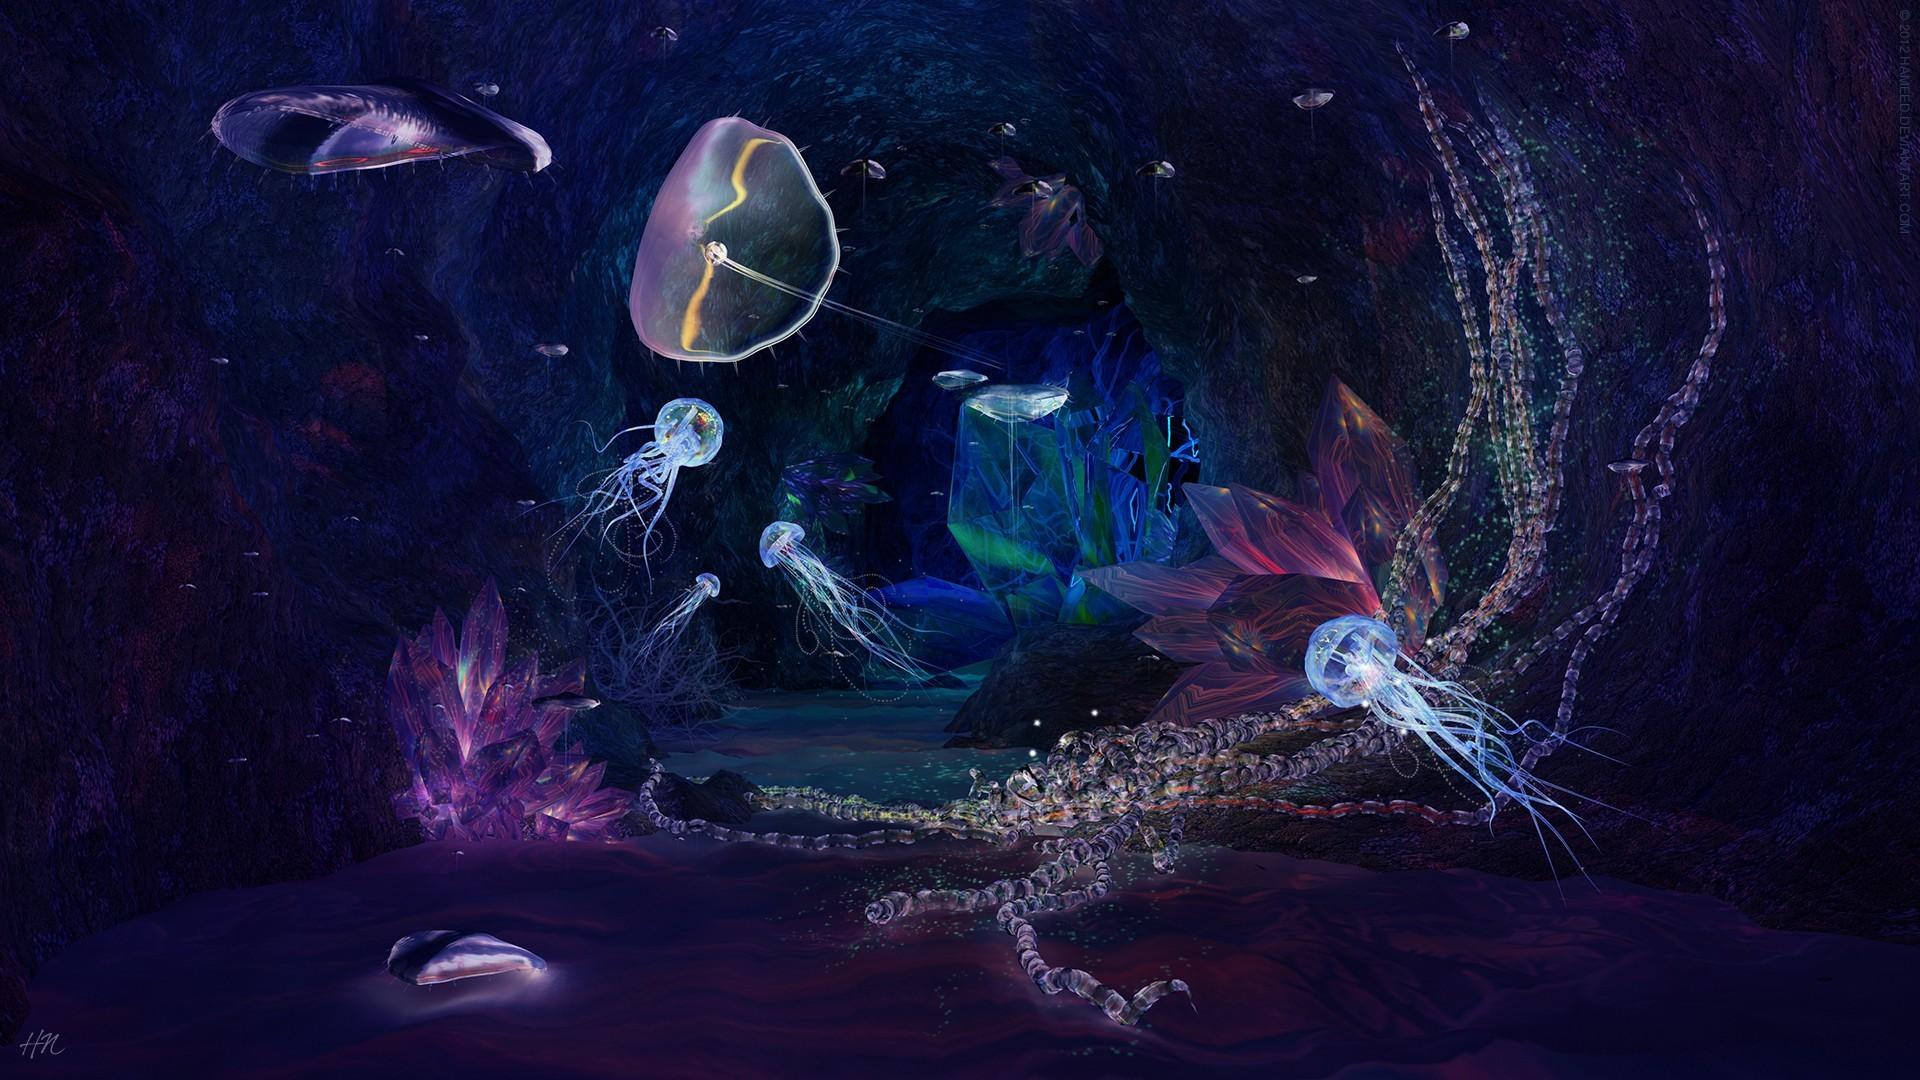 Sealife Tag – Jellyfish Sealife Underwater Nature Oceans Ocean Wallpaper  For Iphone 6 for HD 16